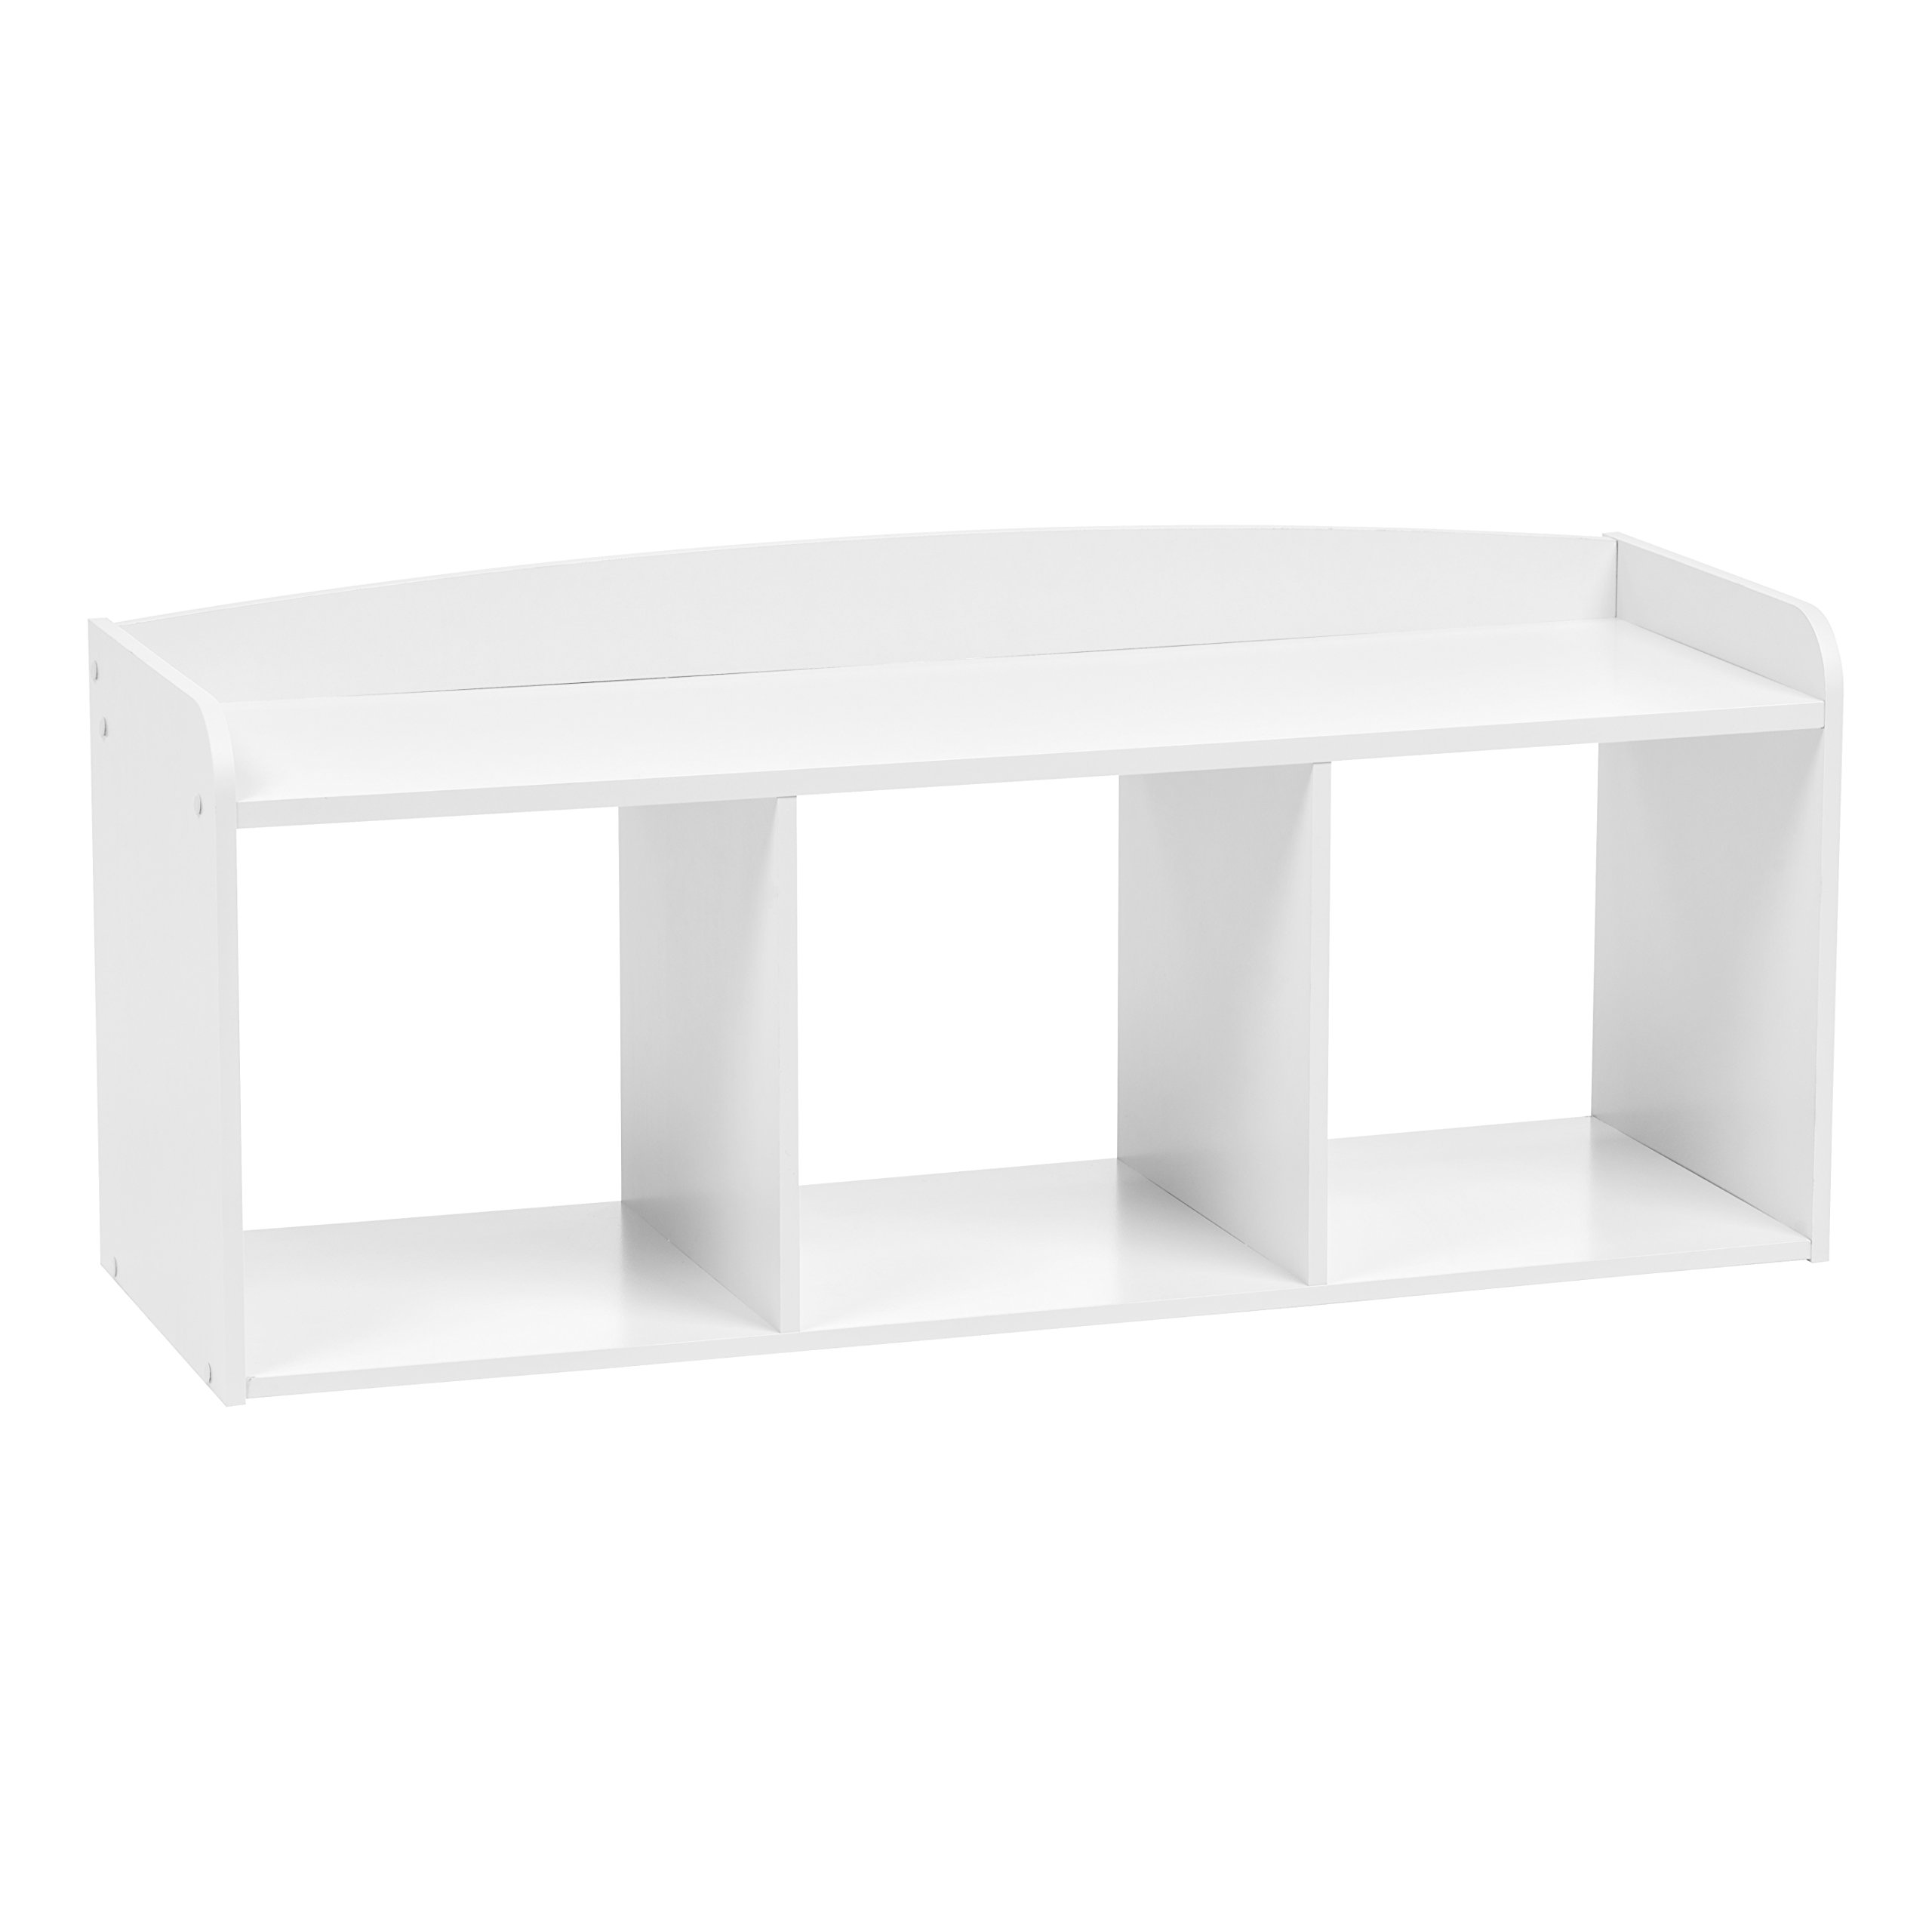 IRIS USA, Inc. 595904 Kbn-3 Kid's Wooden Storage Bench, White by IRIS USA, Inc.